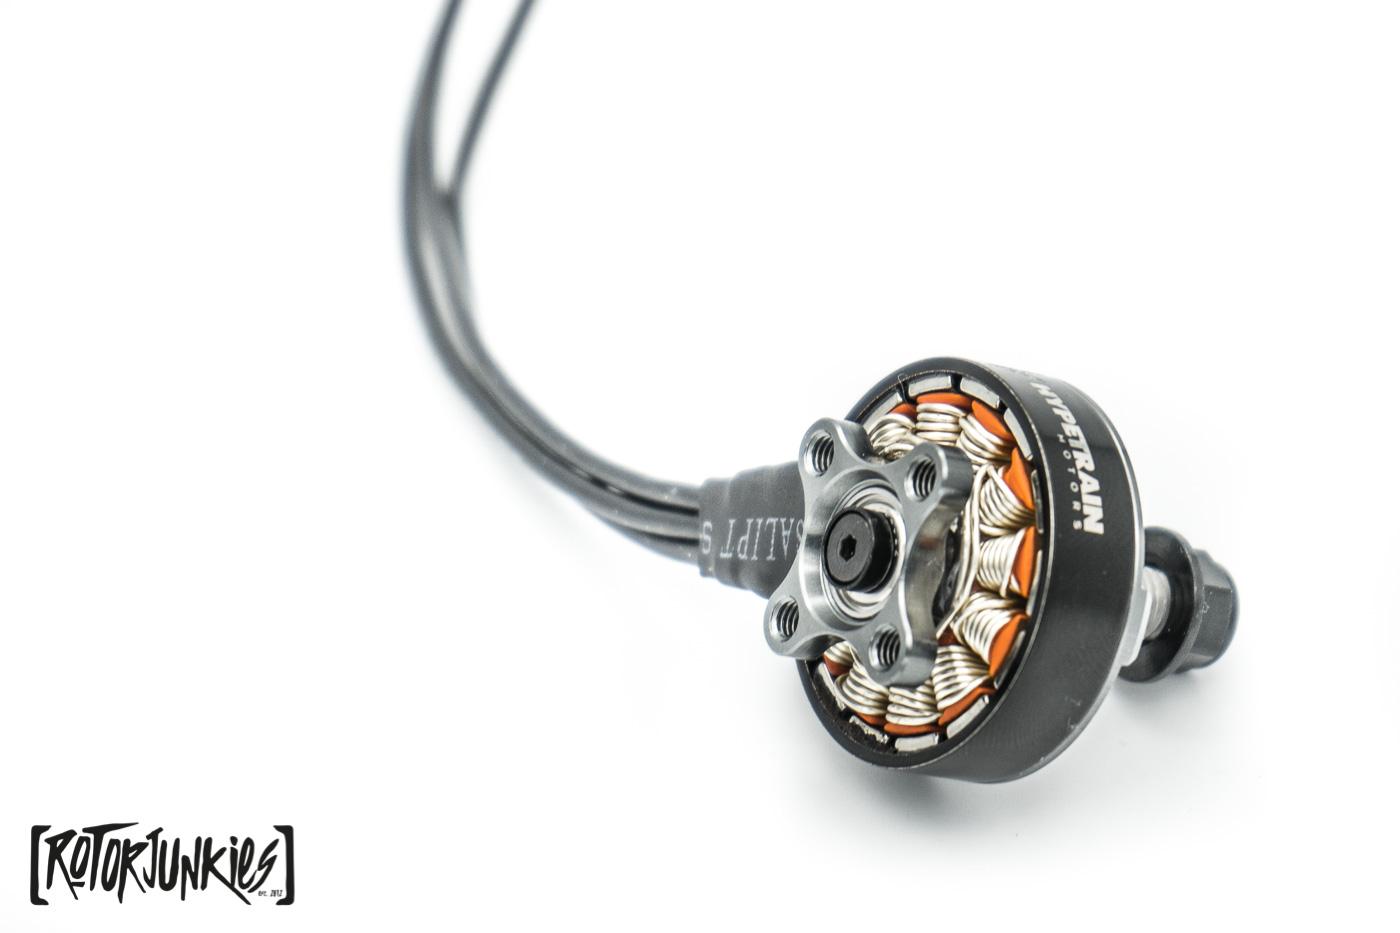 FPV Racer Miniquad Guide - Grundwissen - Tutorials